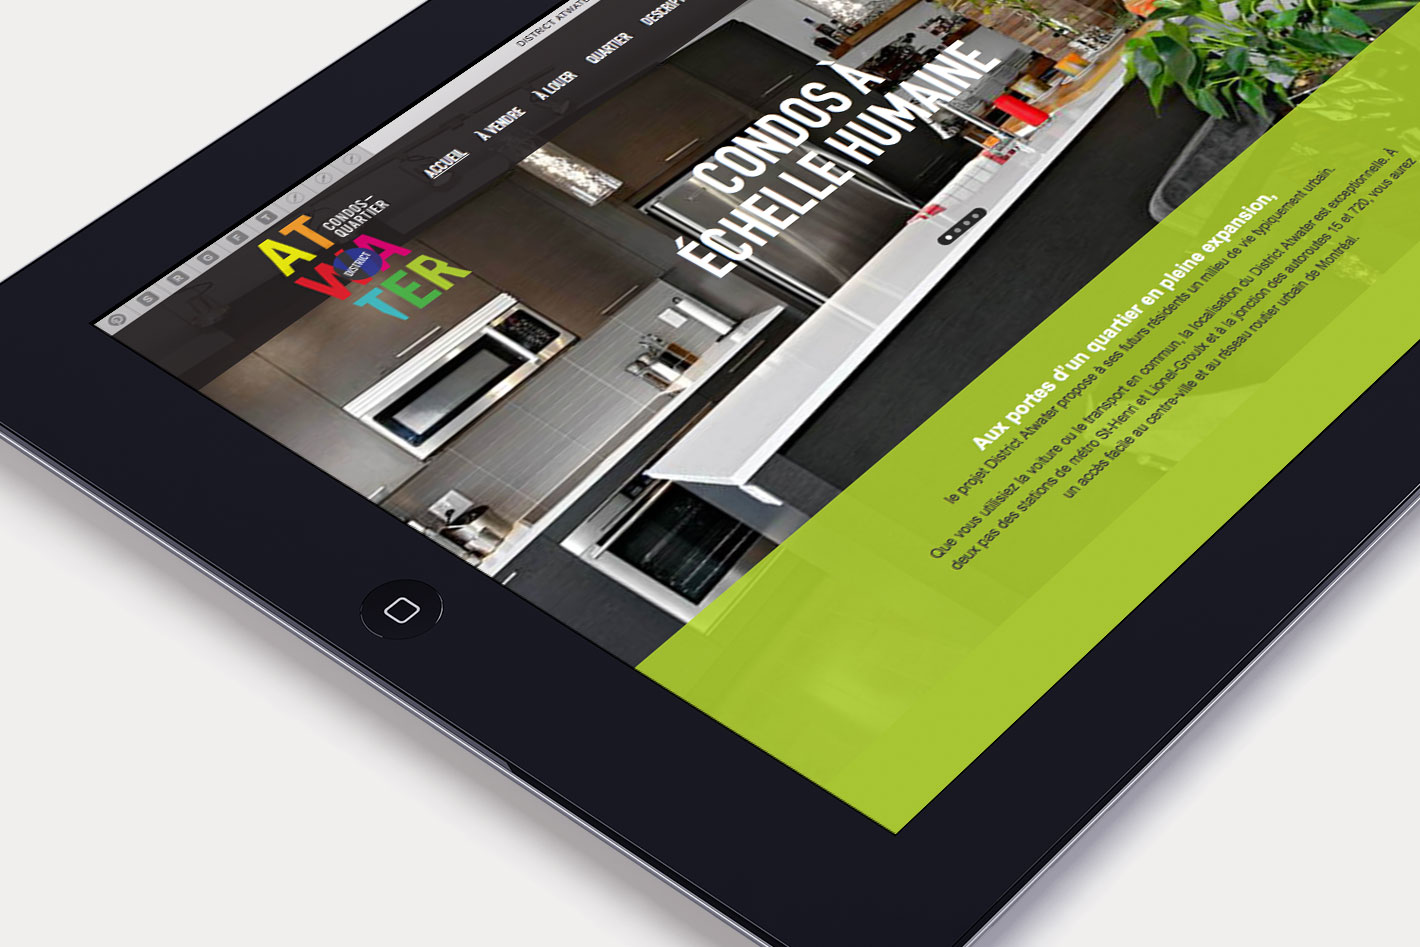 DistrictAtwater_IMGS_1420x947iPad-Angle